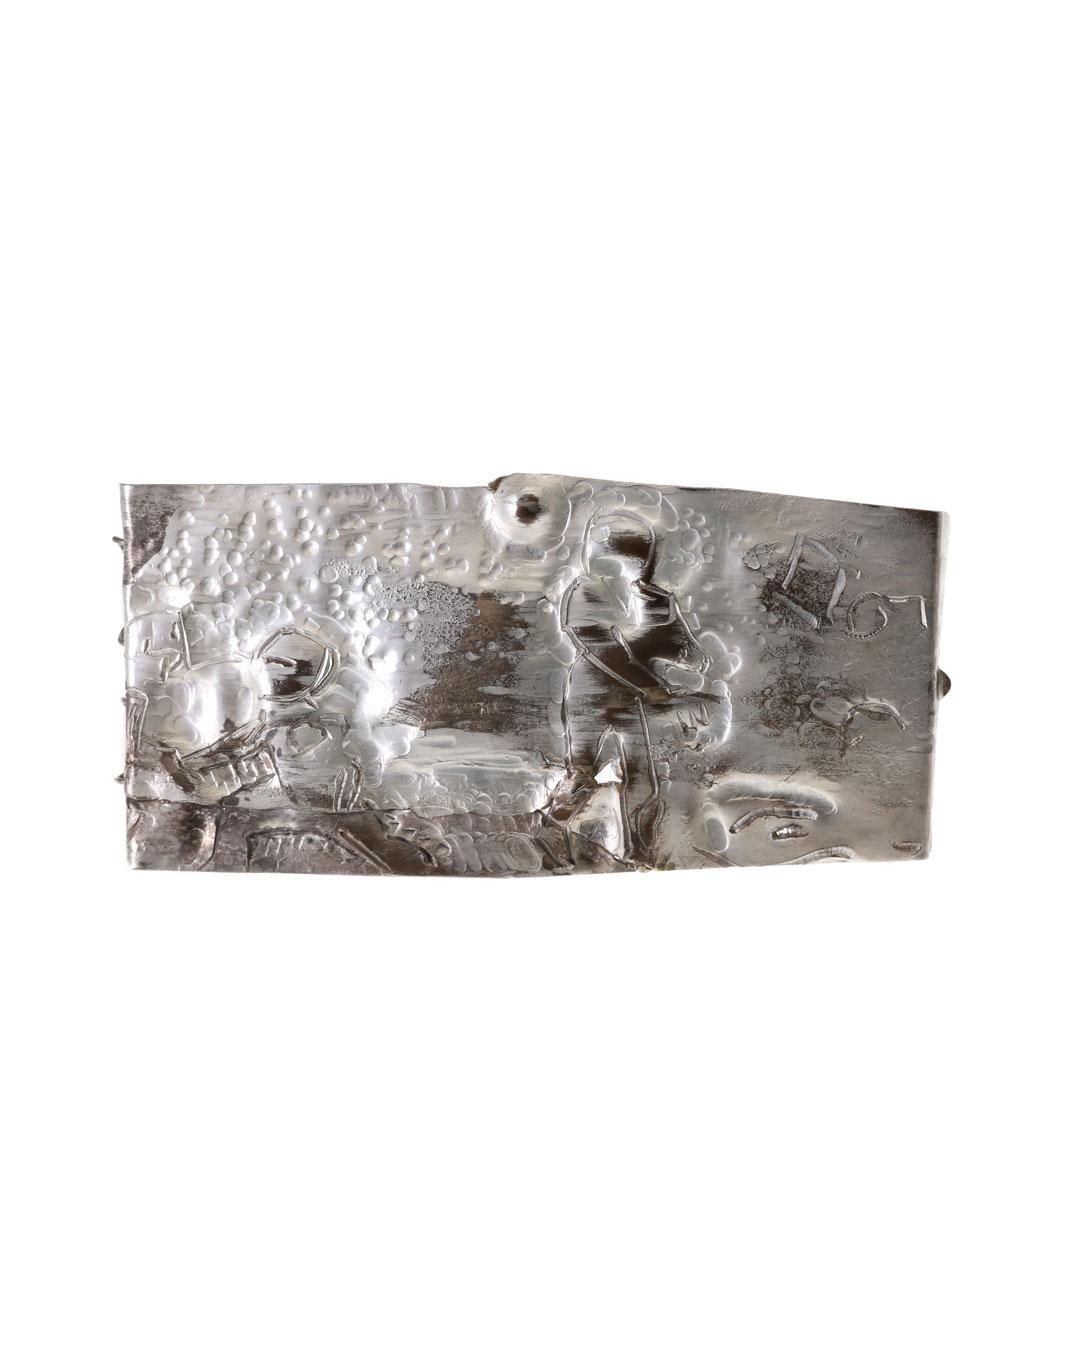 Rudolf Kocéa, Super Bowl, 2017, brooch; silver, copper, 155 x 80 x 10 mm, €2400